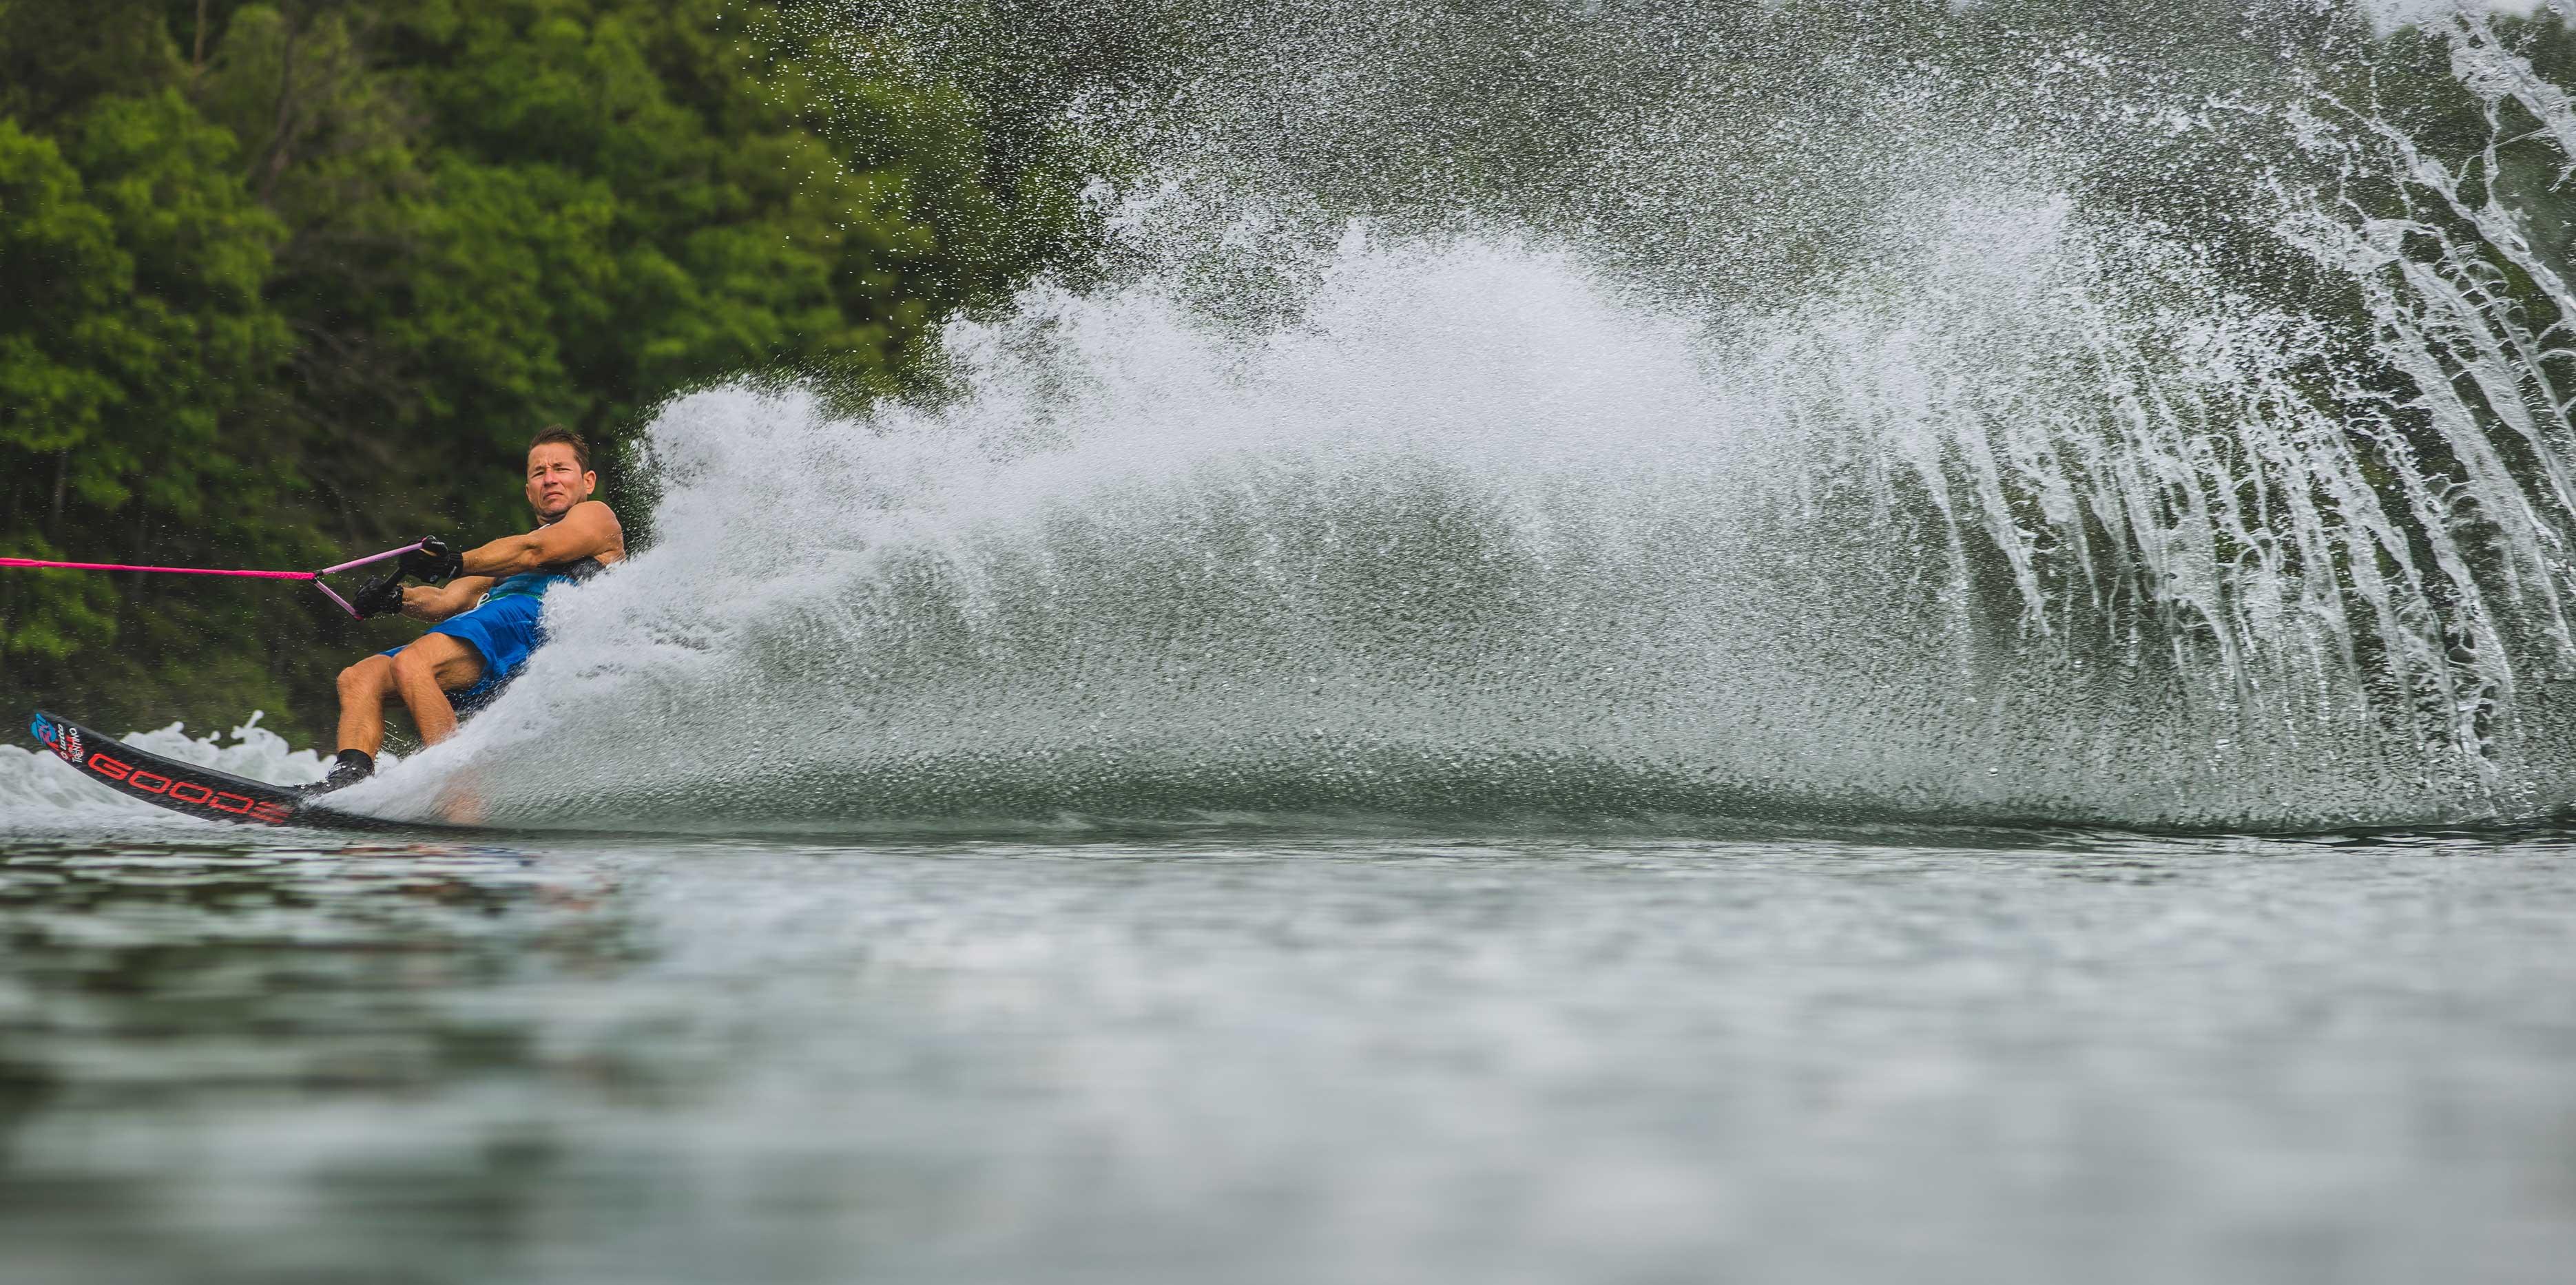 What Makes a Great Water Ski Boat | Malibu Boats